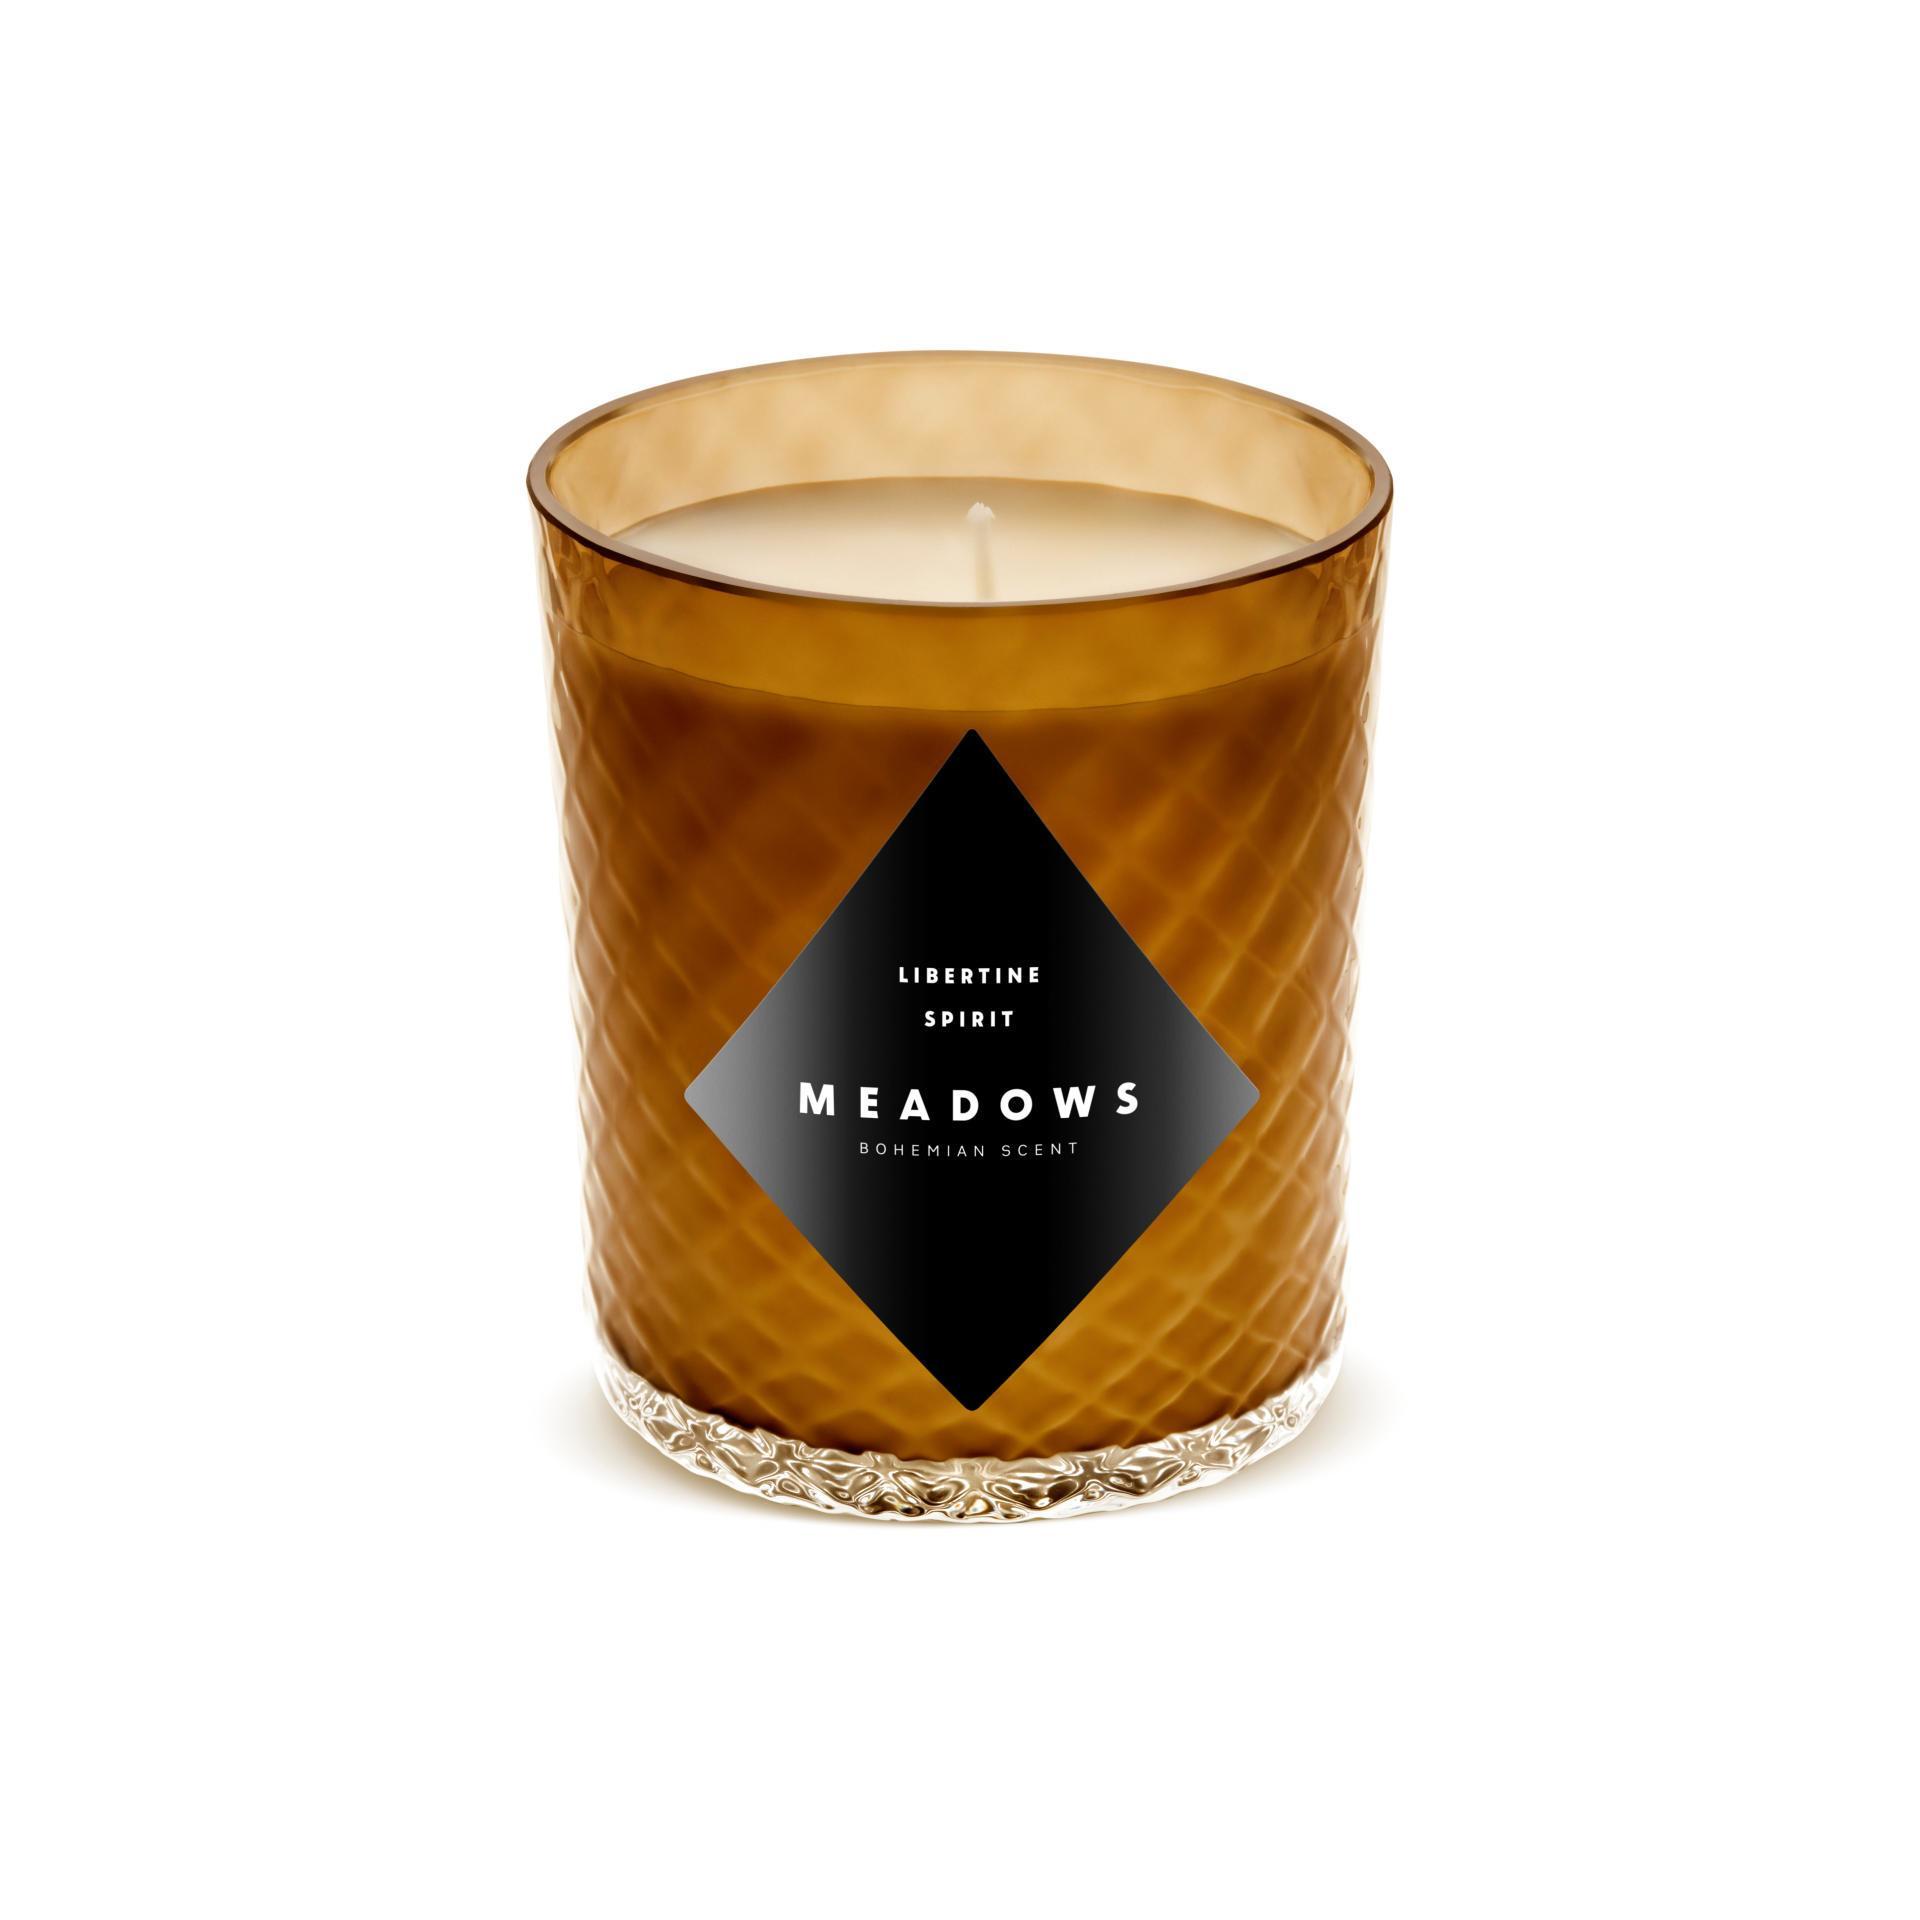 MEADOWS Luxusní vonná svíčka Libertine Spirit, oranžová barva, sklo